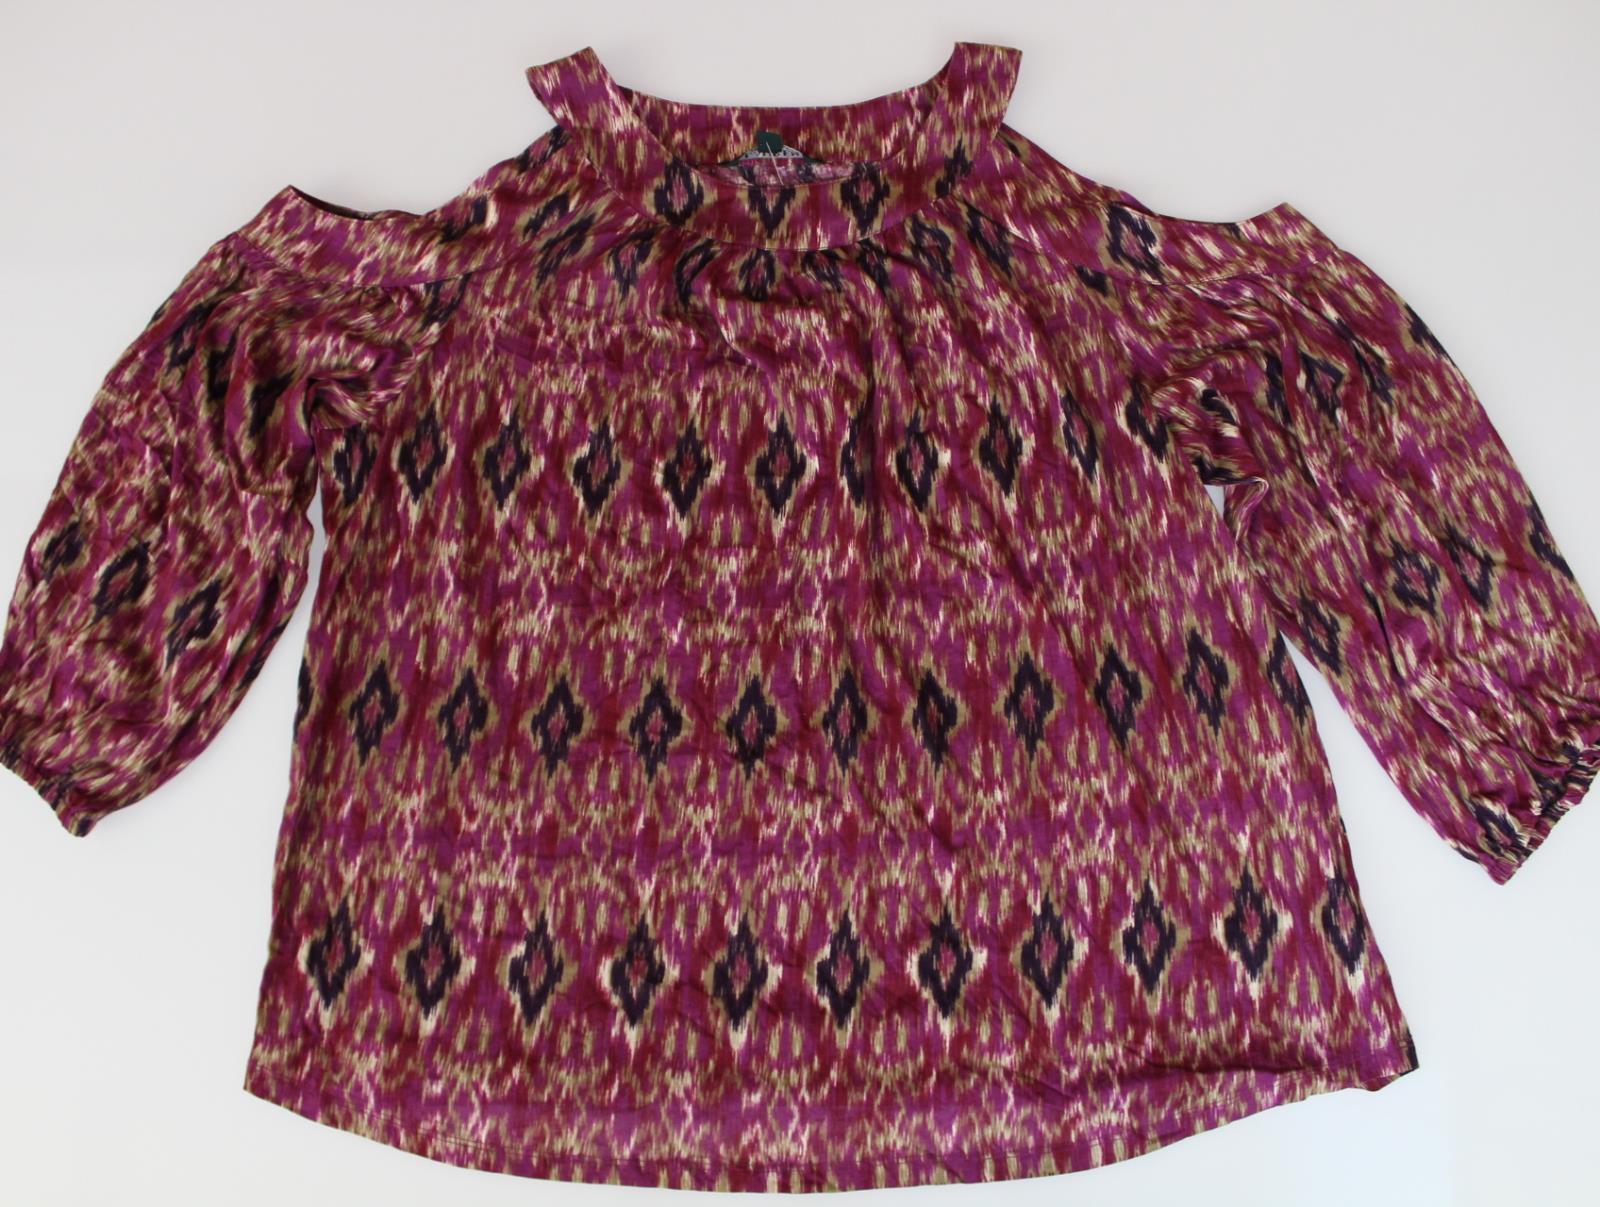 2X NY Collection Women/'s Plus Size Faux-Shrug Black//White Dress MSRP$70.0 1028